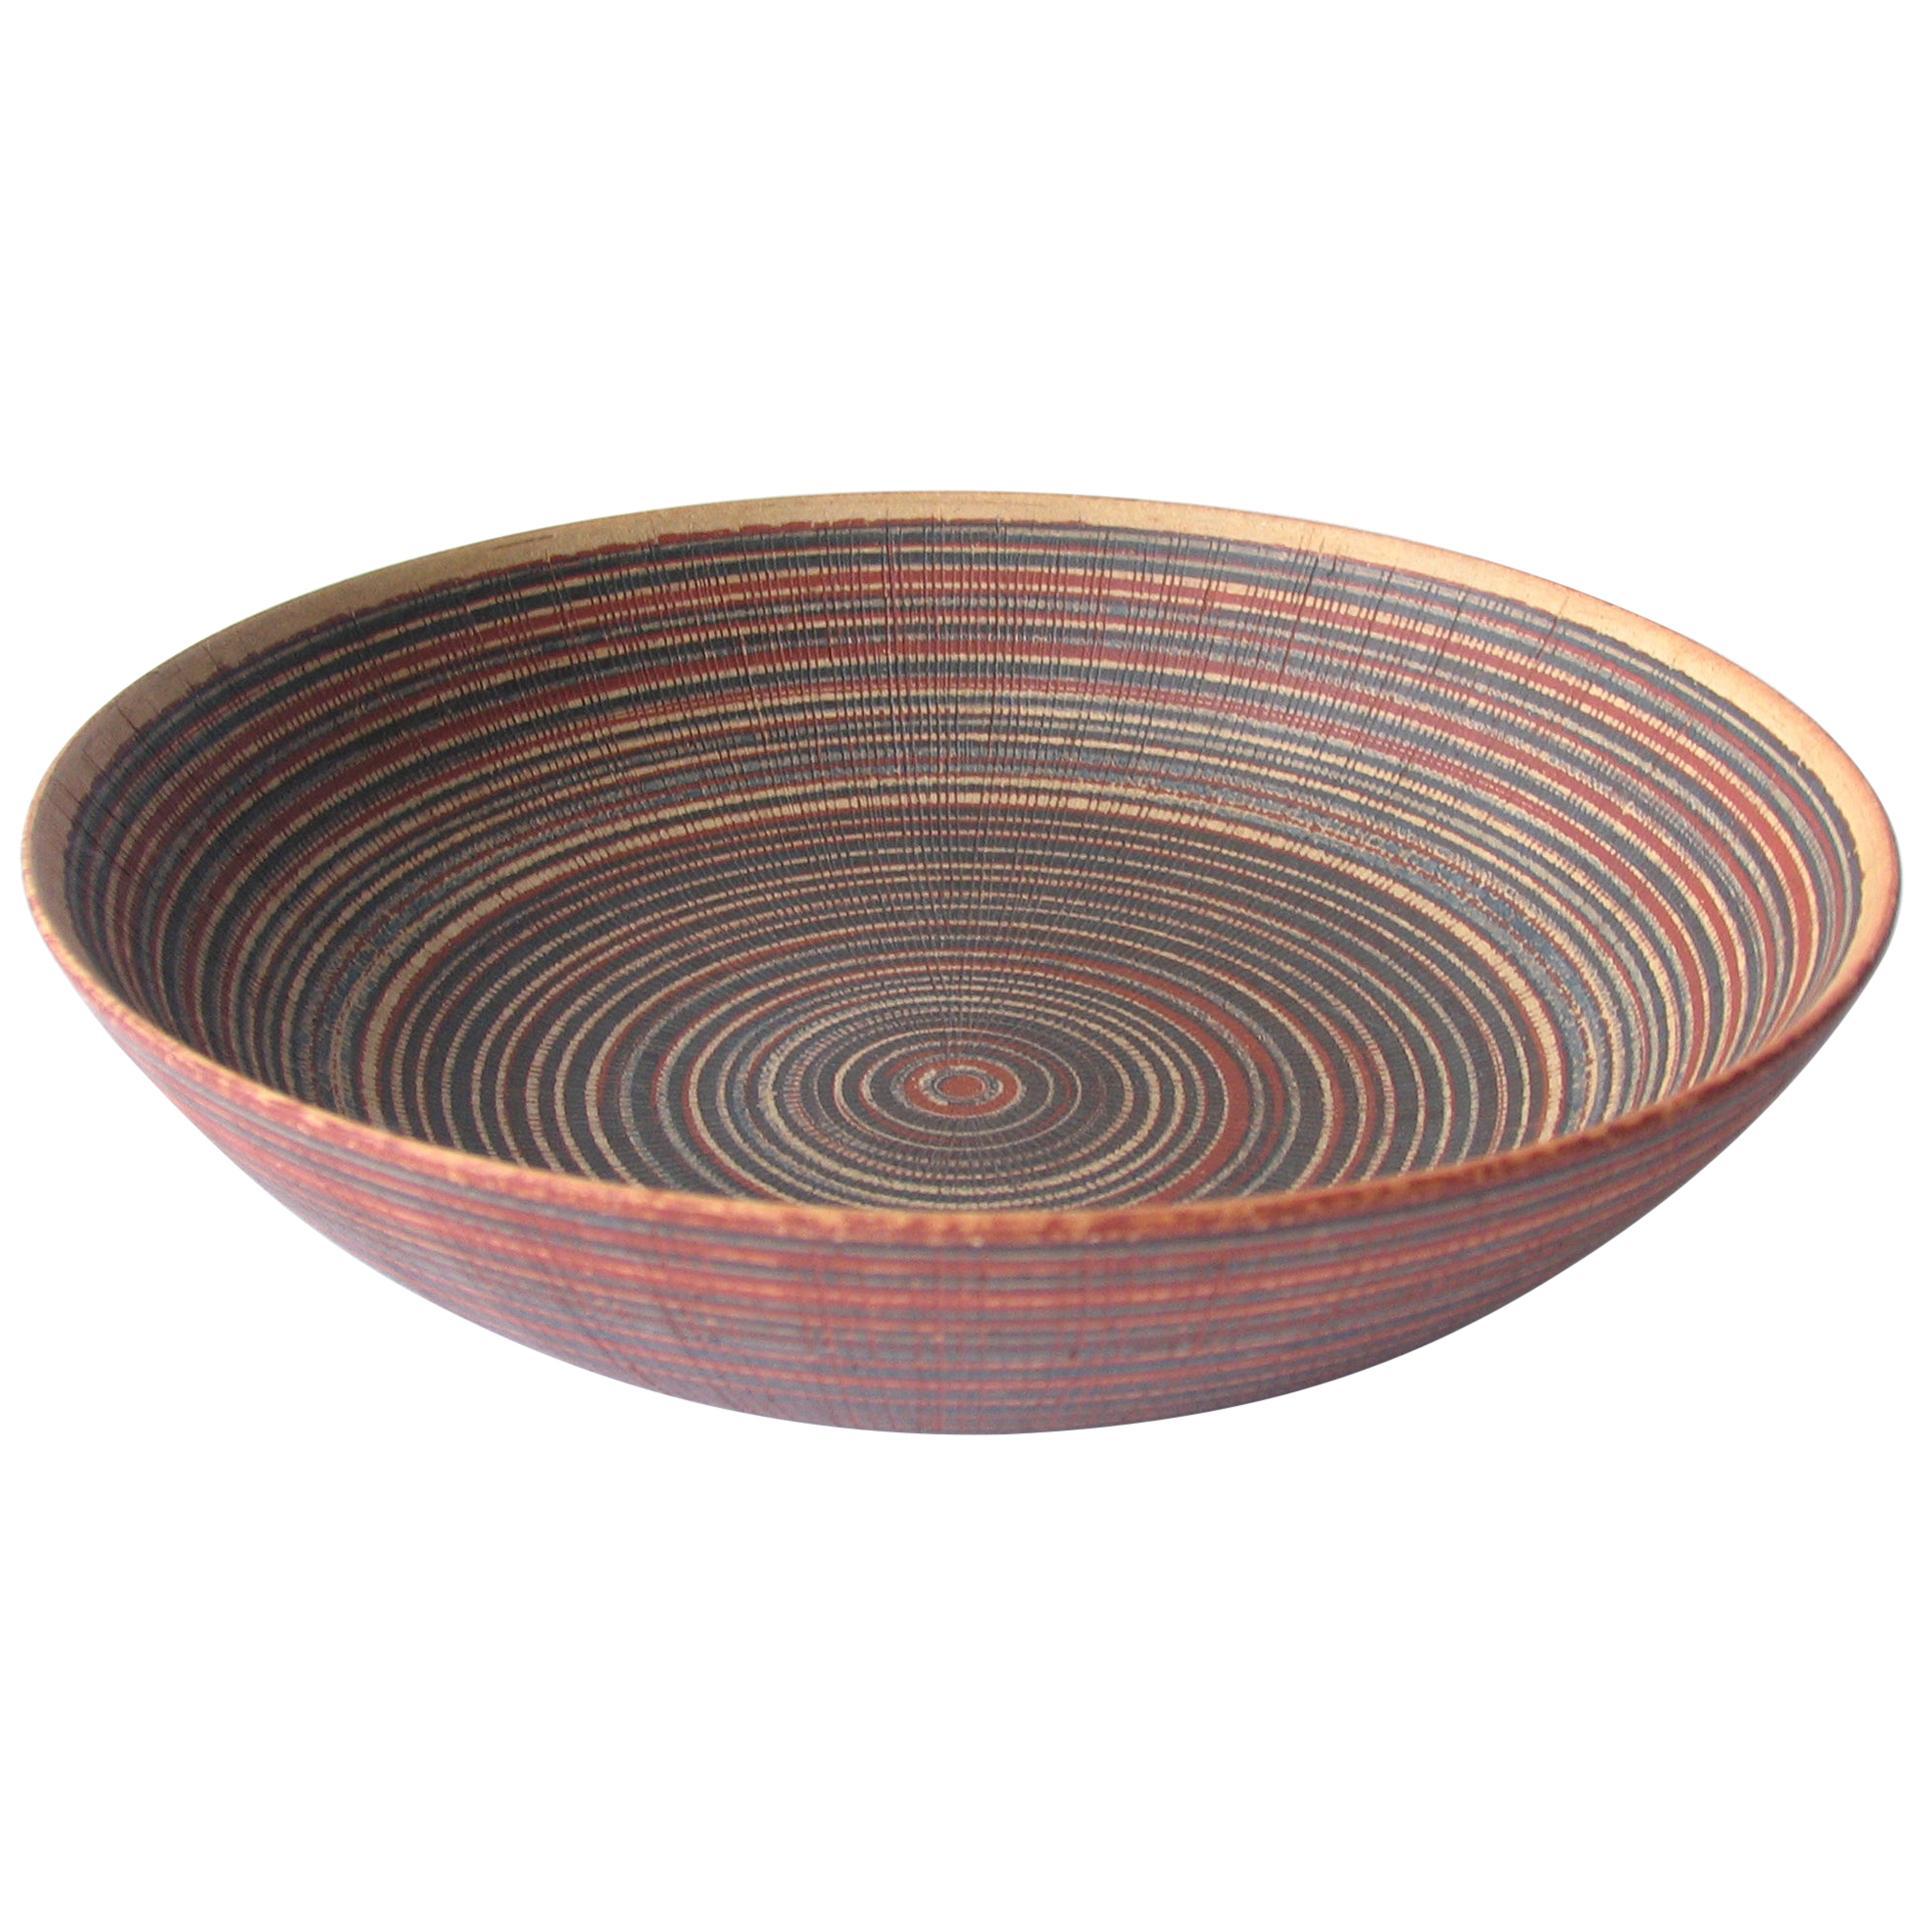 Wilhelm Kage Striped Stoneware Farsta Bowl Gustavsberg